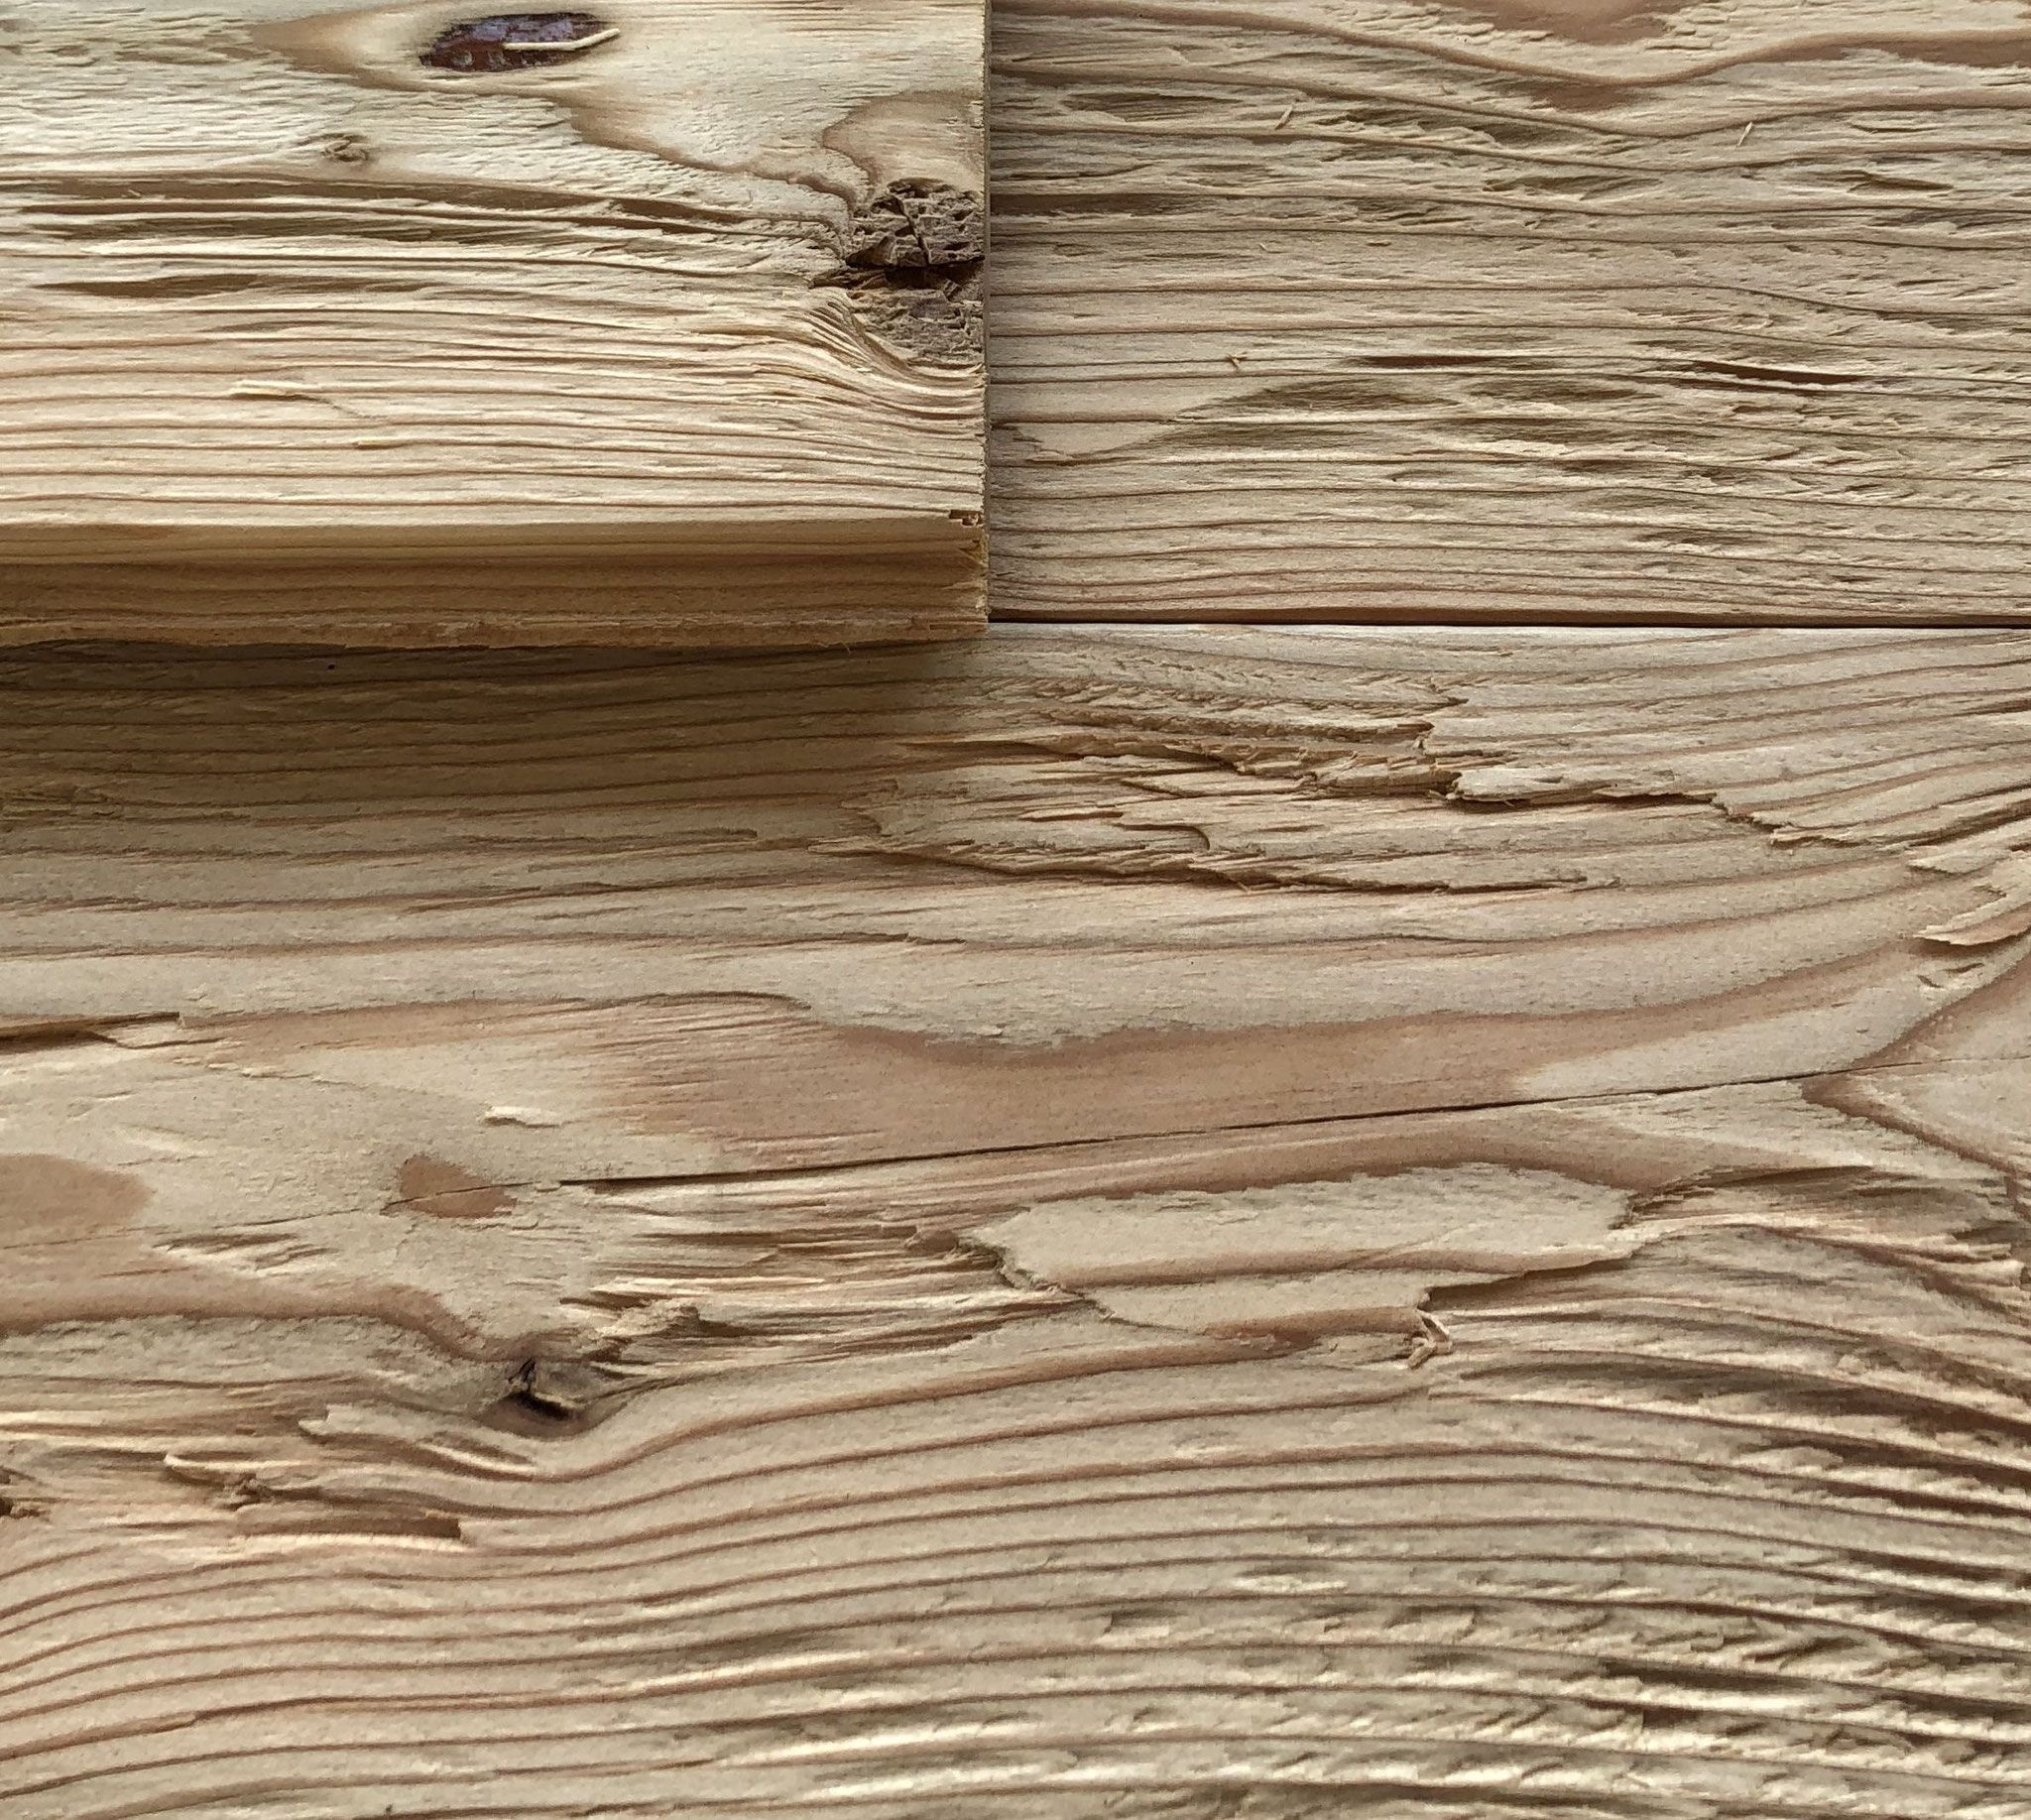 Fichte Natur Vintage Holz Wandverkleidung Holz Wandverkleidung Altholz Wandverkleidung